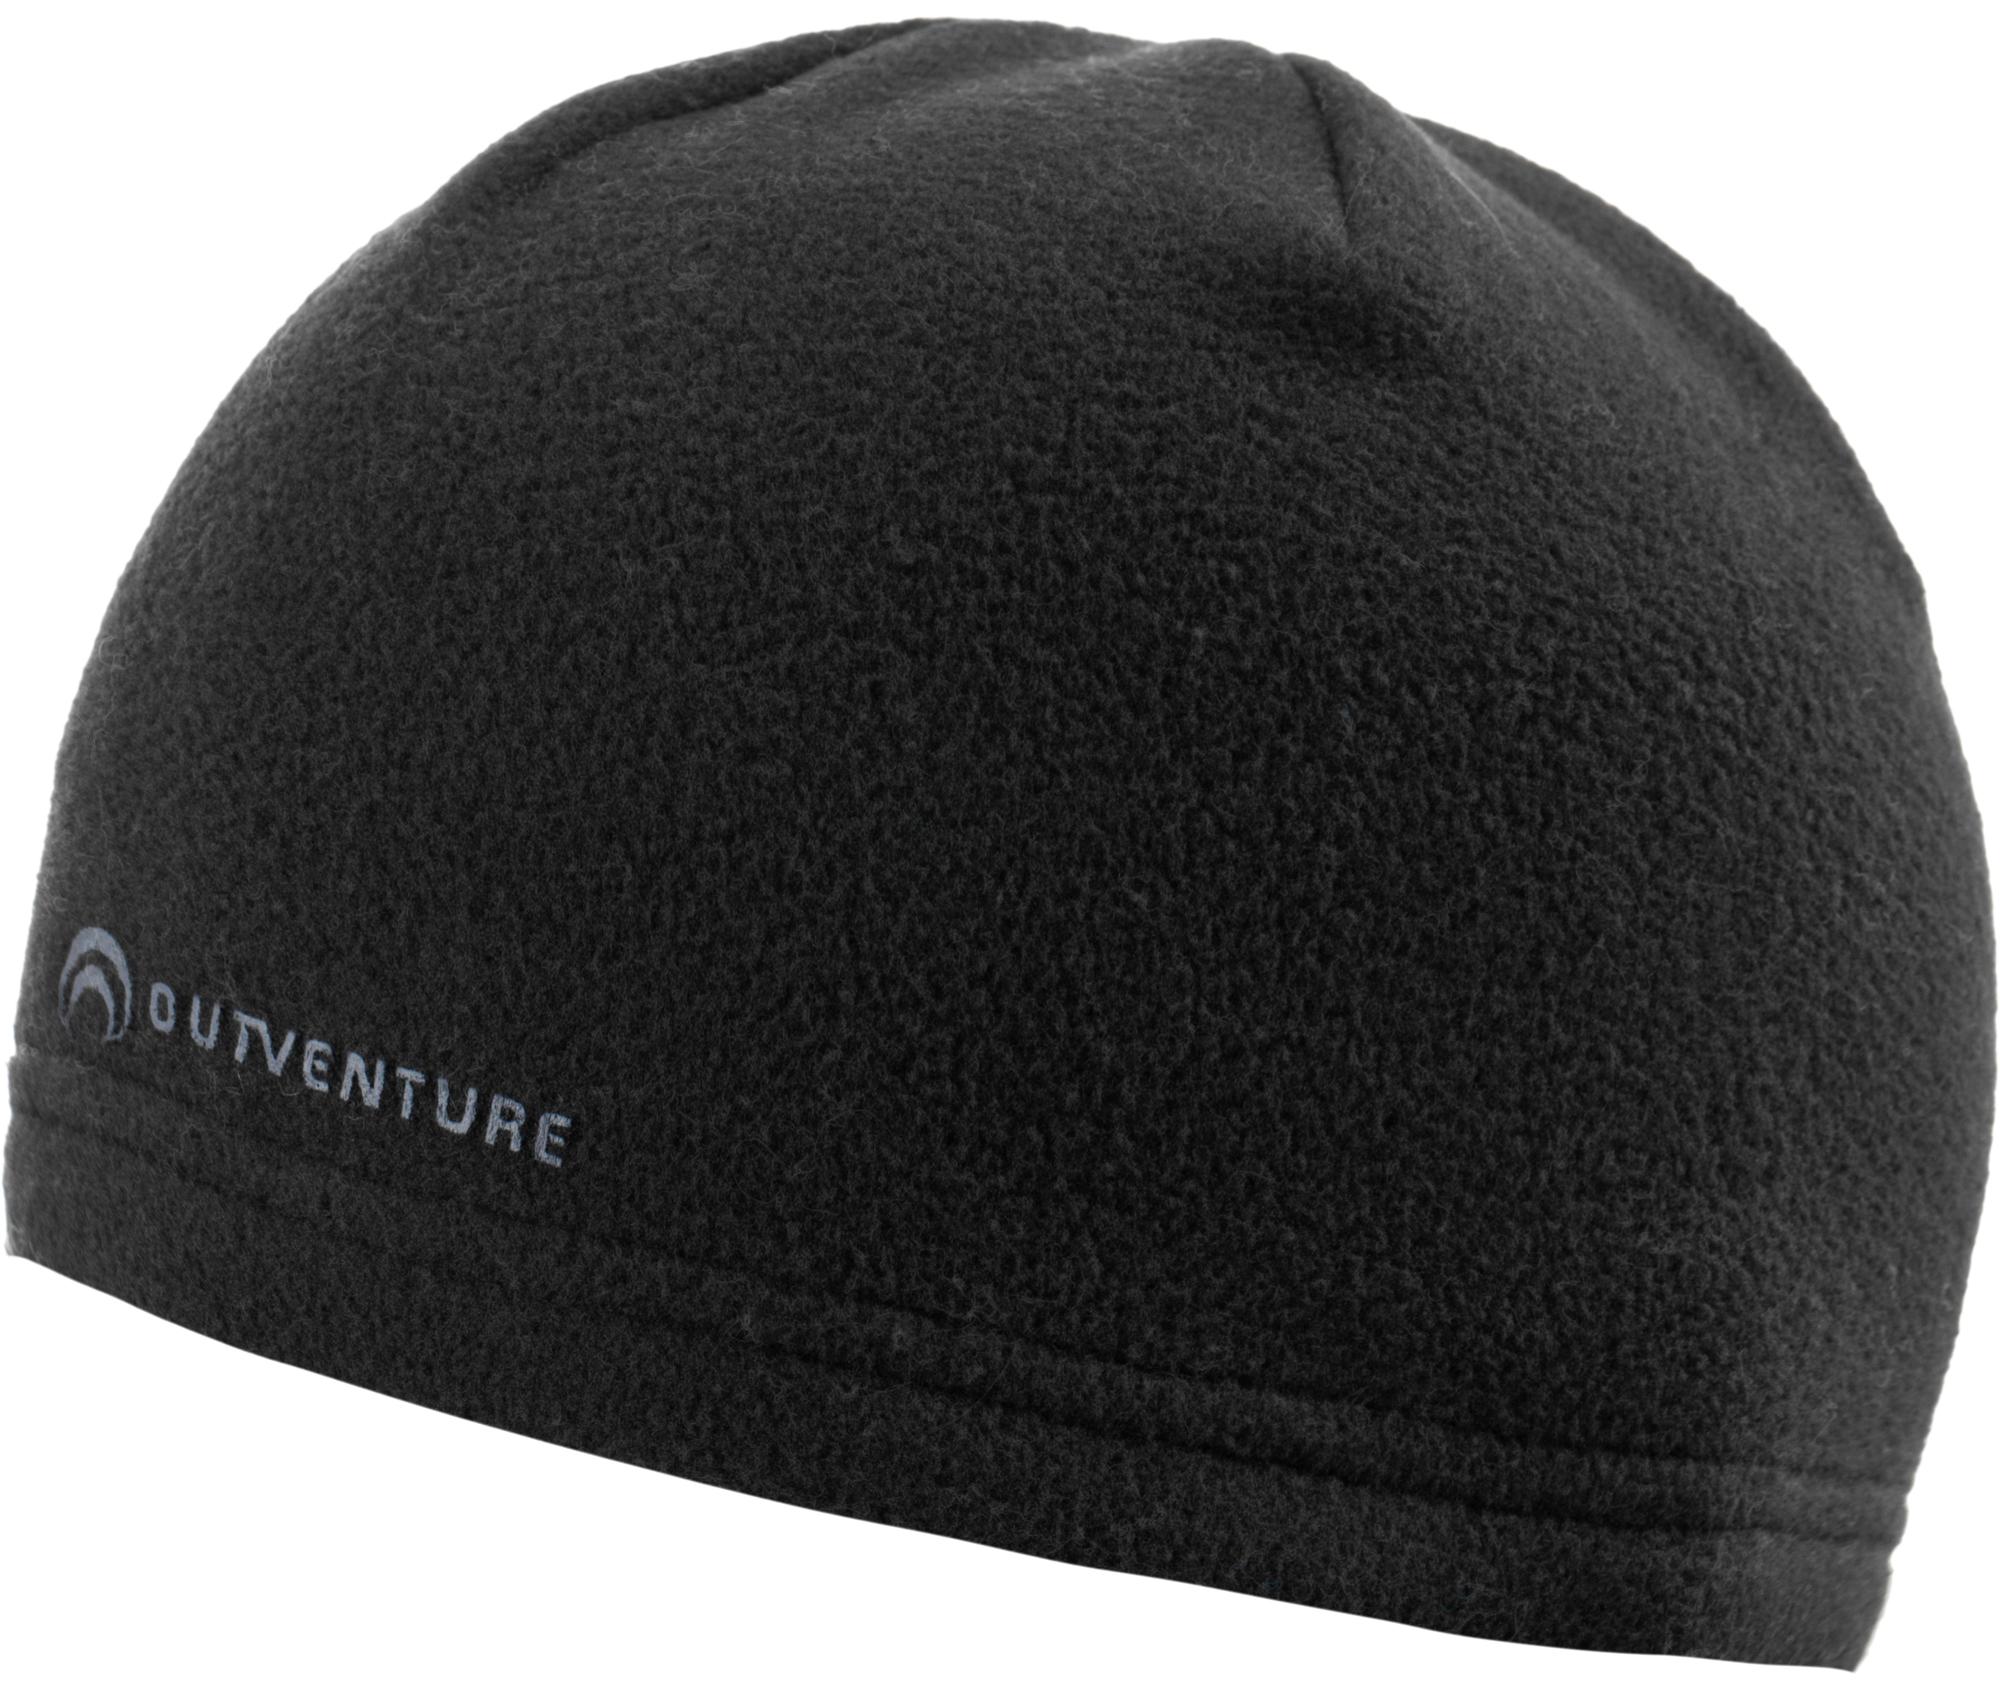 Outventure Шапка для мальчиков Outventure, размер Без размера